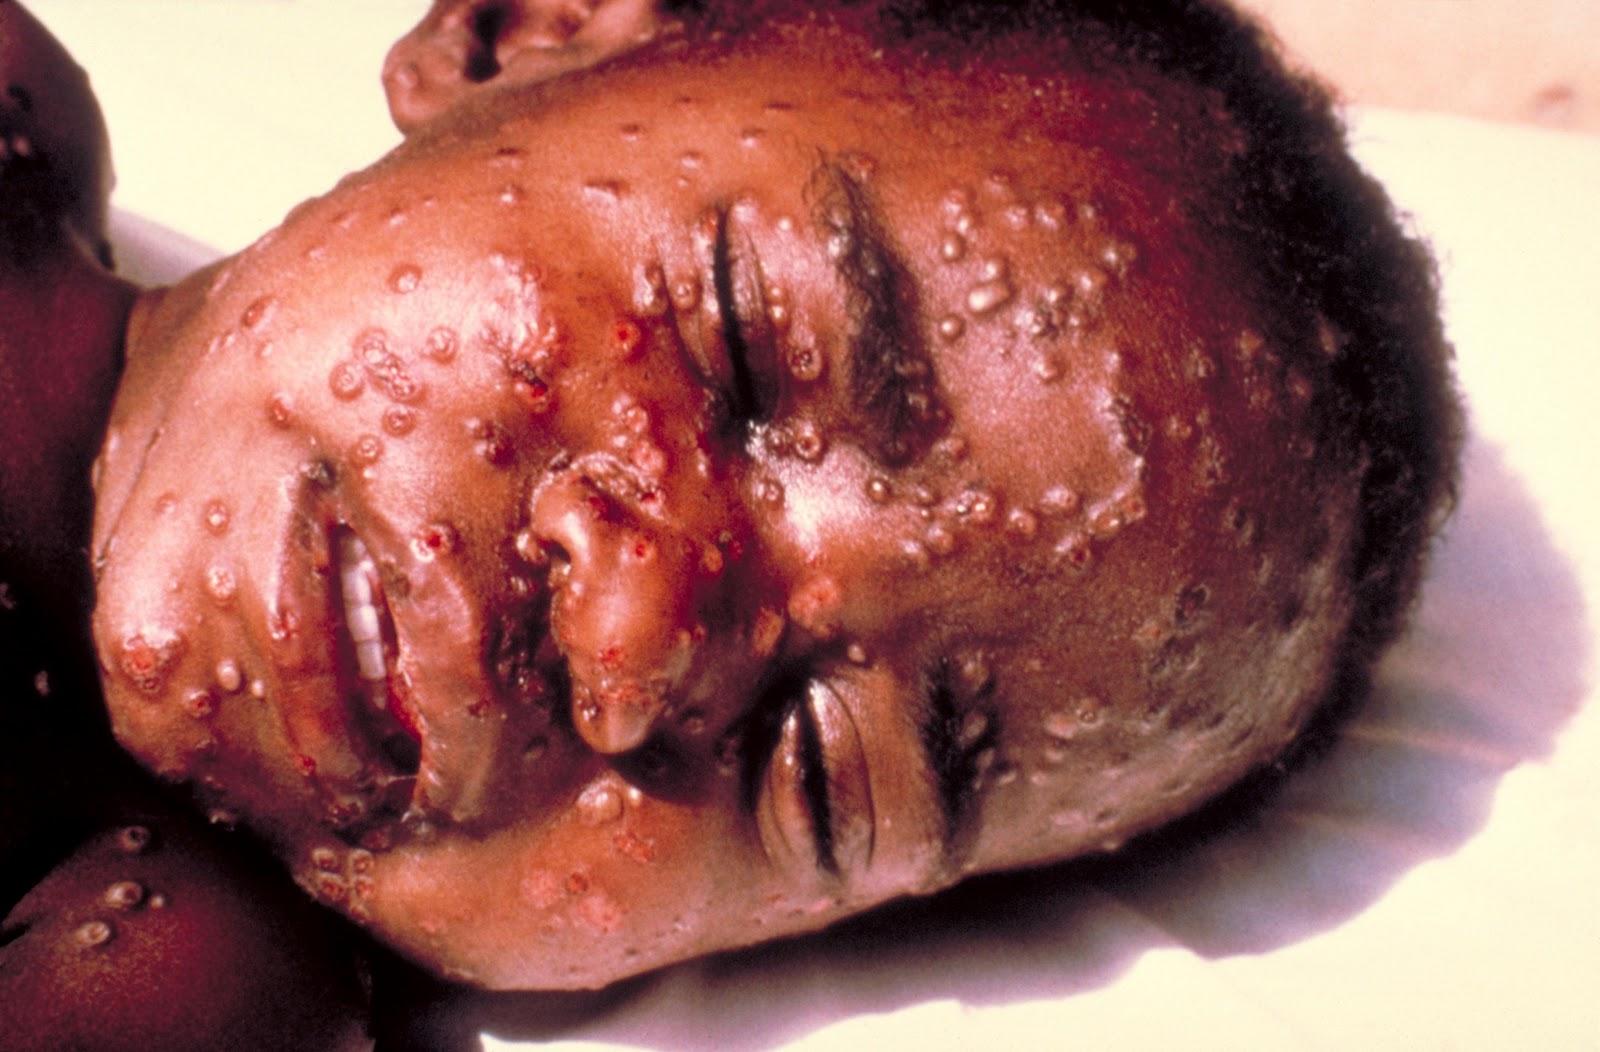 http://2.bp.blogspot.com/_kUokZVFwYj8/TOImIOR-l1I/AAAAAAAAAJU/Uq3S-xScjiU/s1600/Smallpox.jpg